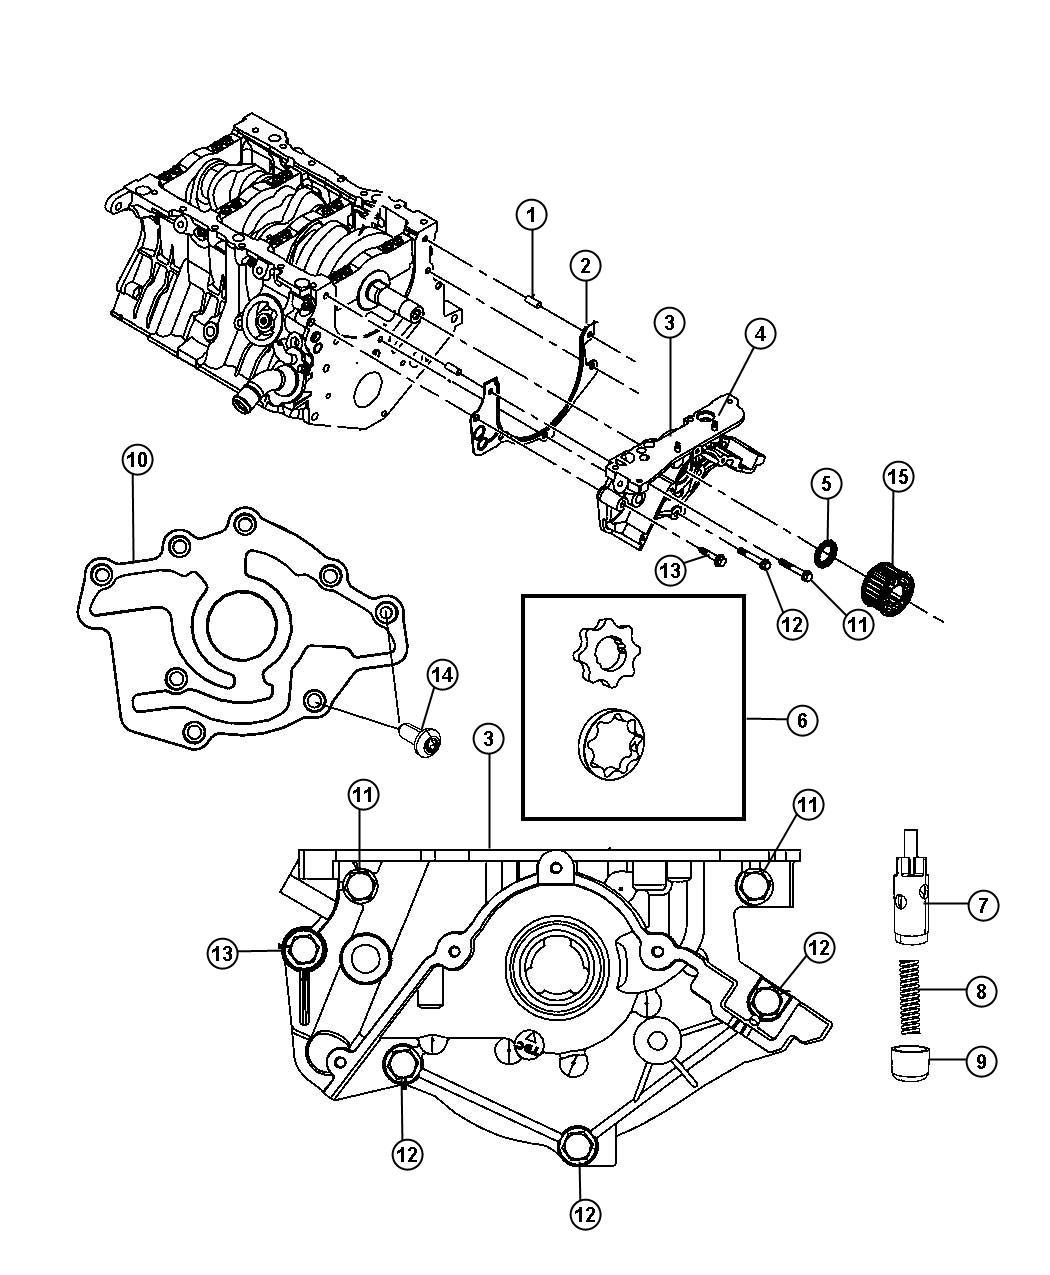 Chrysler Pacifica Engine Oiling Pump 4 0l 4 0l V6 Sohc